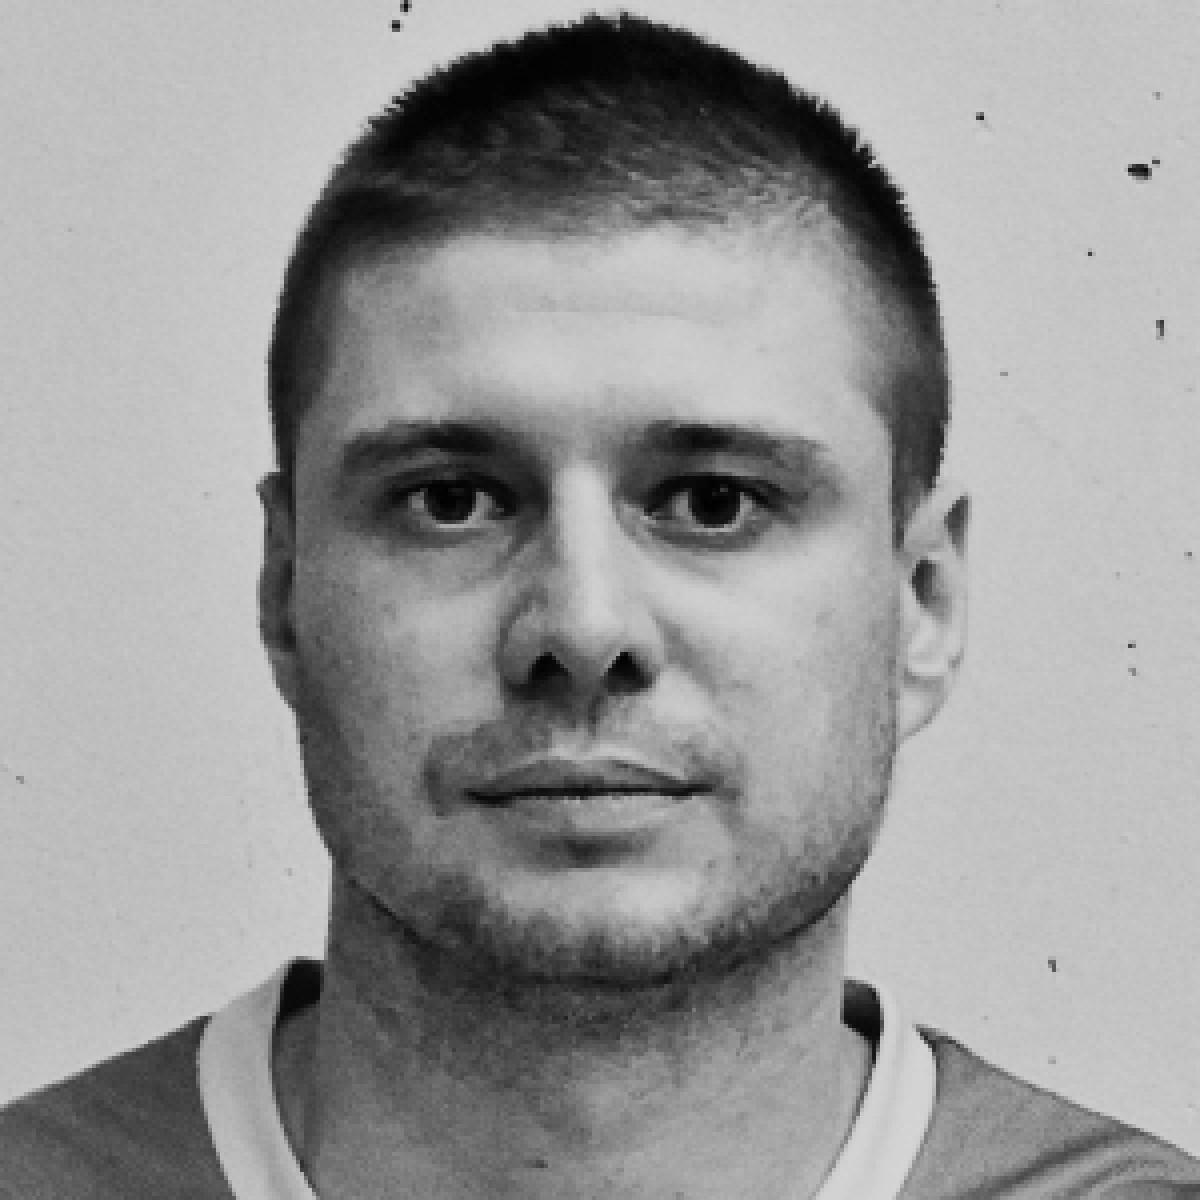 Bojan Sekicki